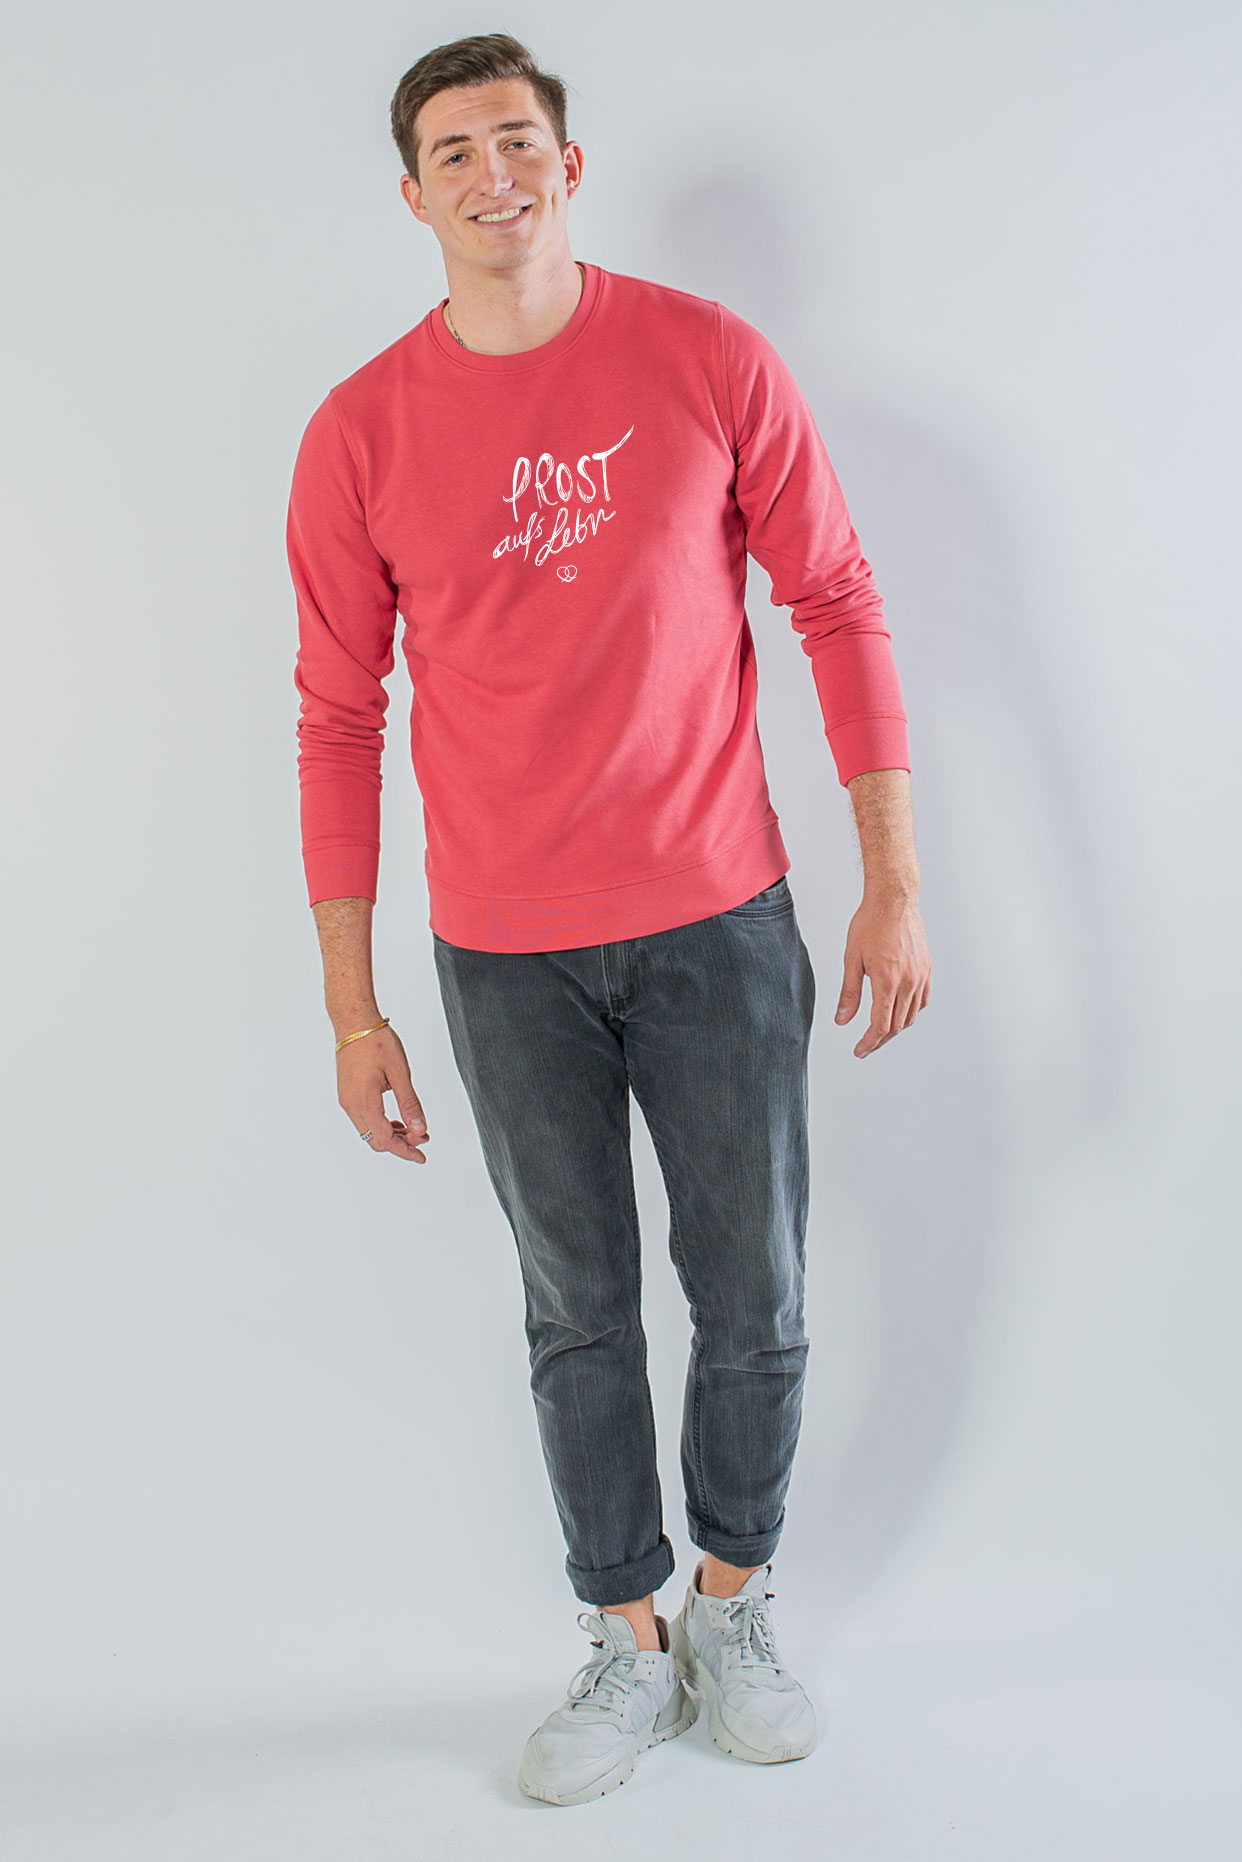 Prost Unisex Sweater